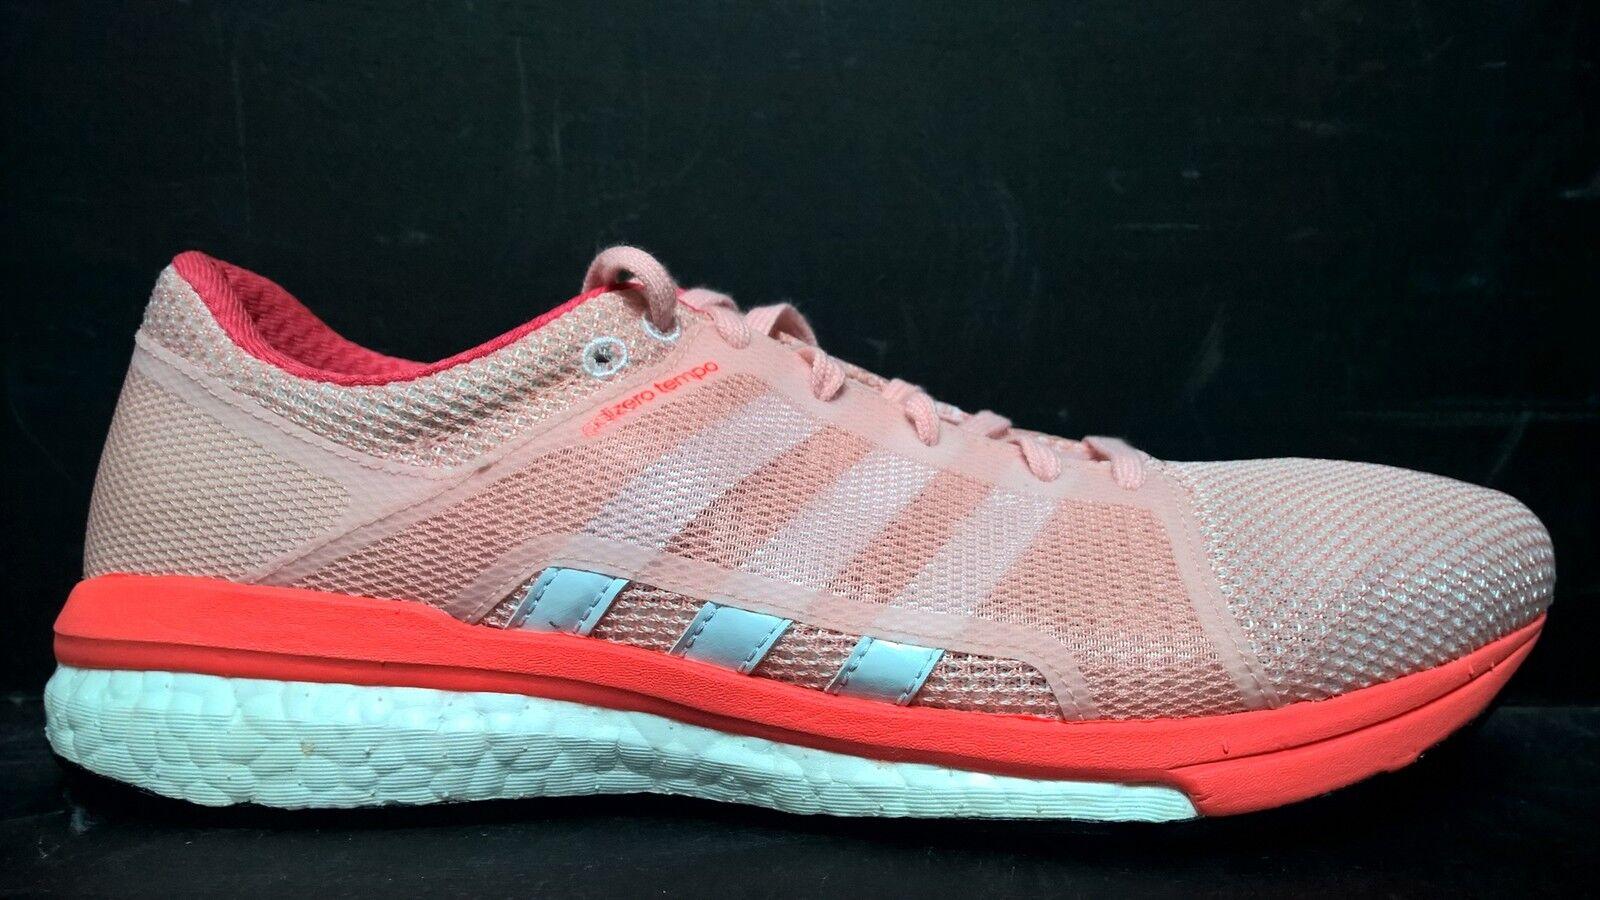 Adidas Donna Size 8.5 Adizero Tempo 8 SSF Running Running Running Shoes, AQ6112, Pink White dccc2e